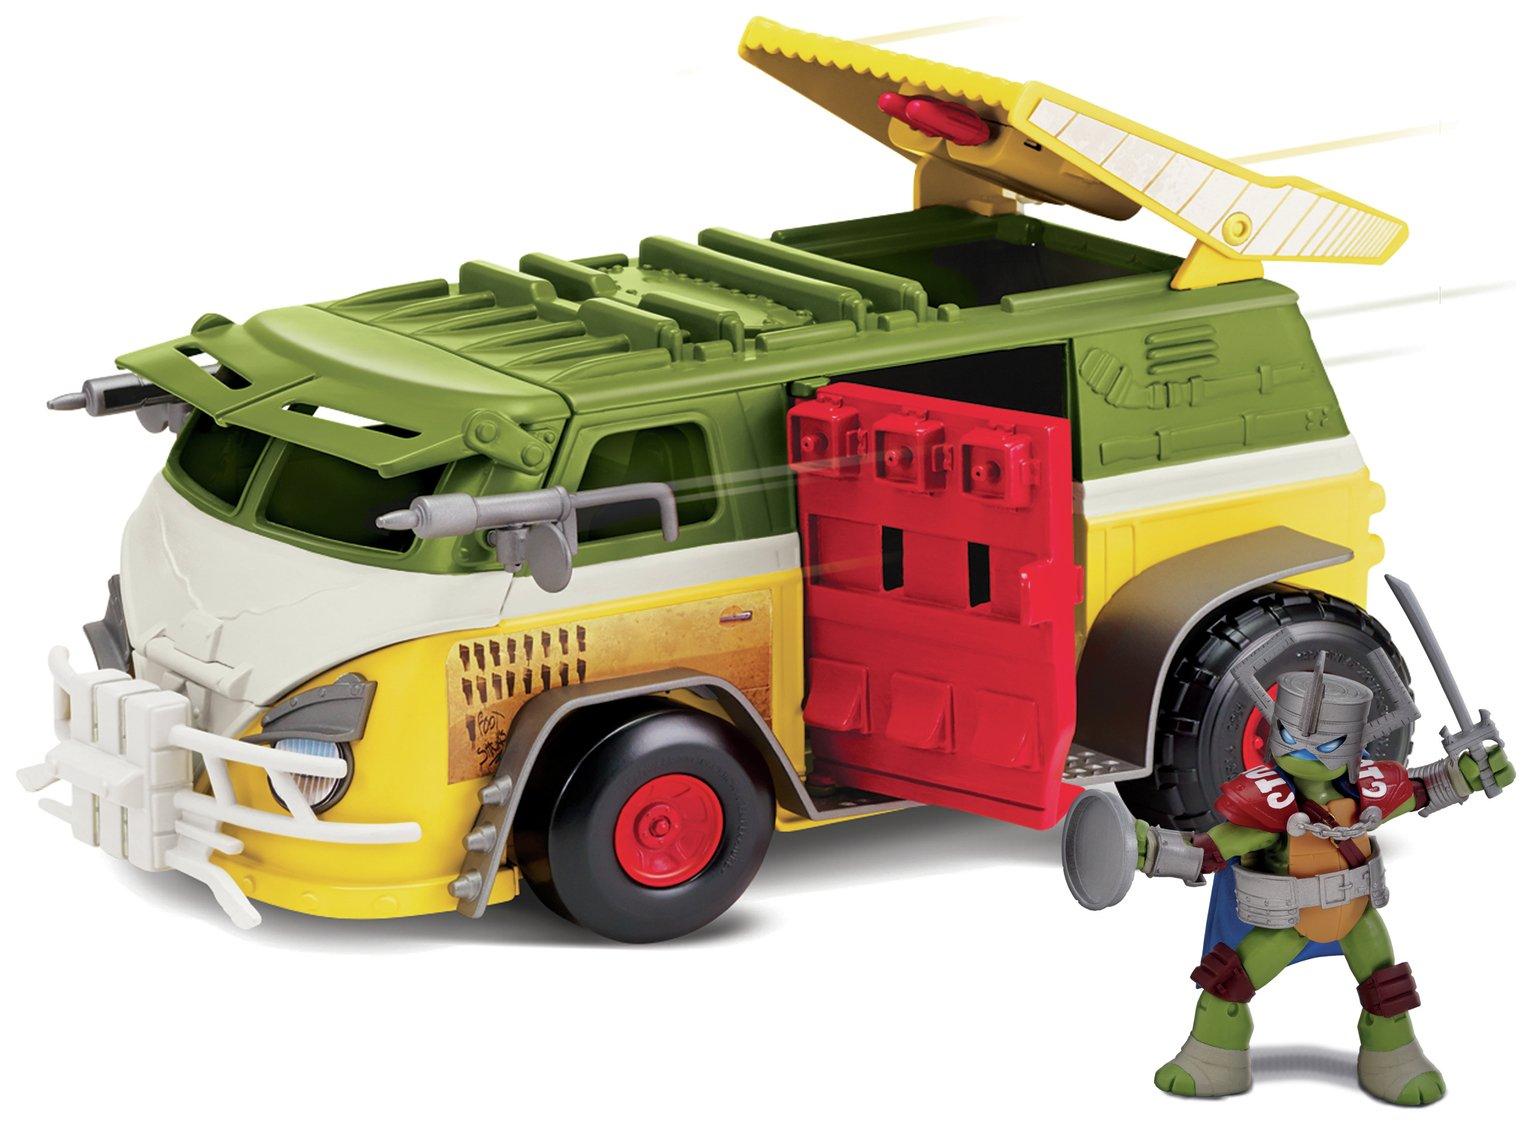 Teenage Mutant Ninja Turtles Party Van with Figure